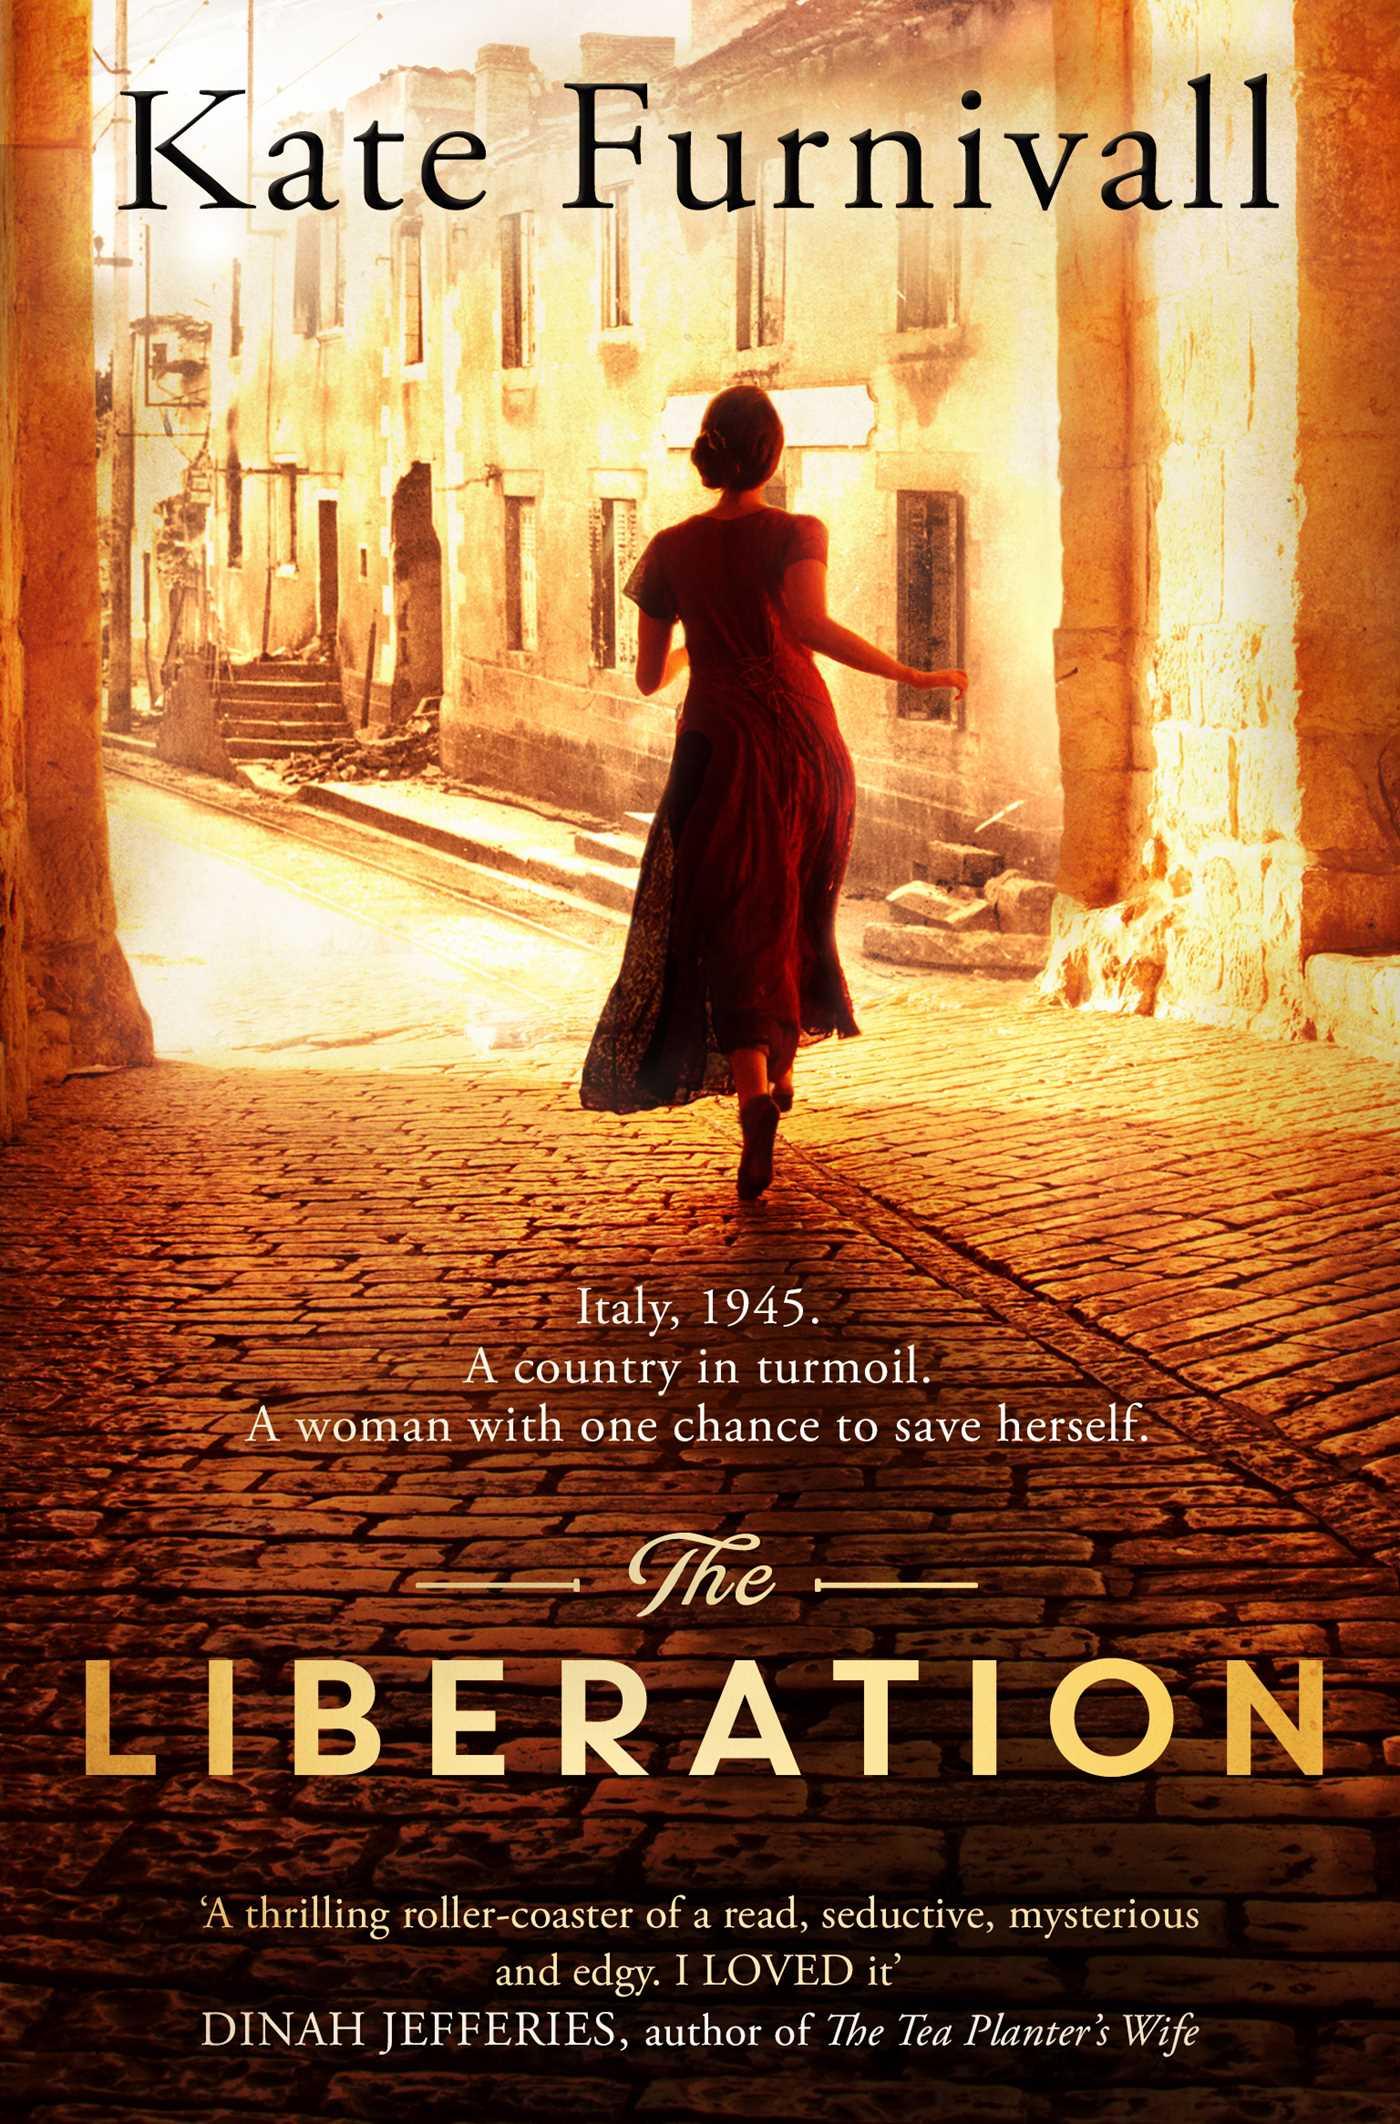 The liberation 9781471155574 hr